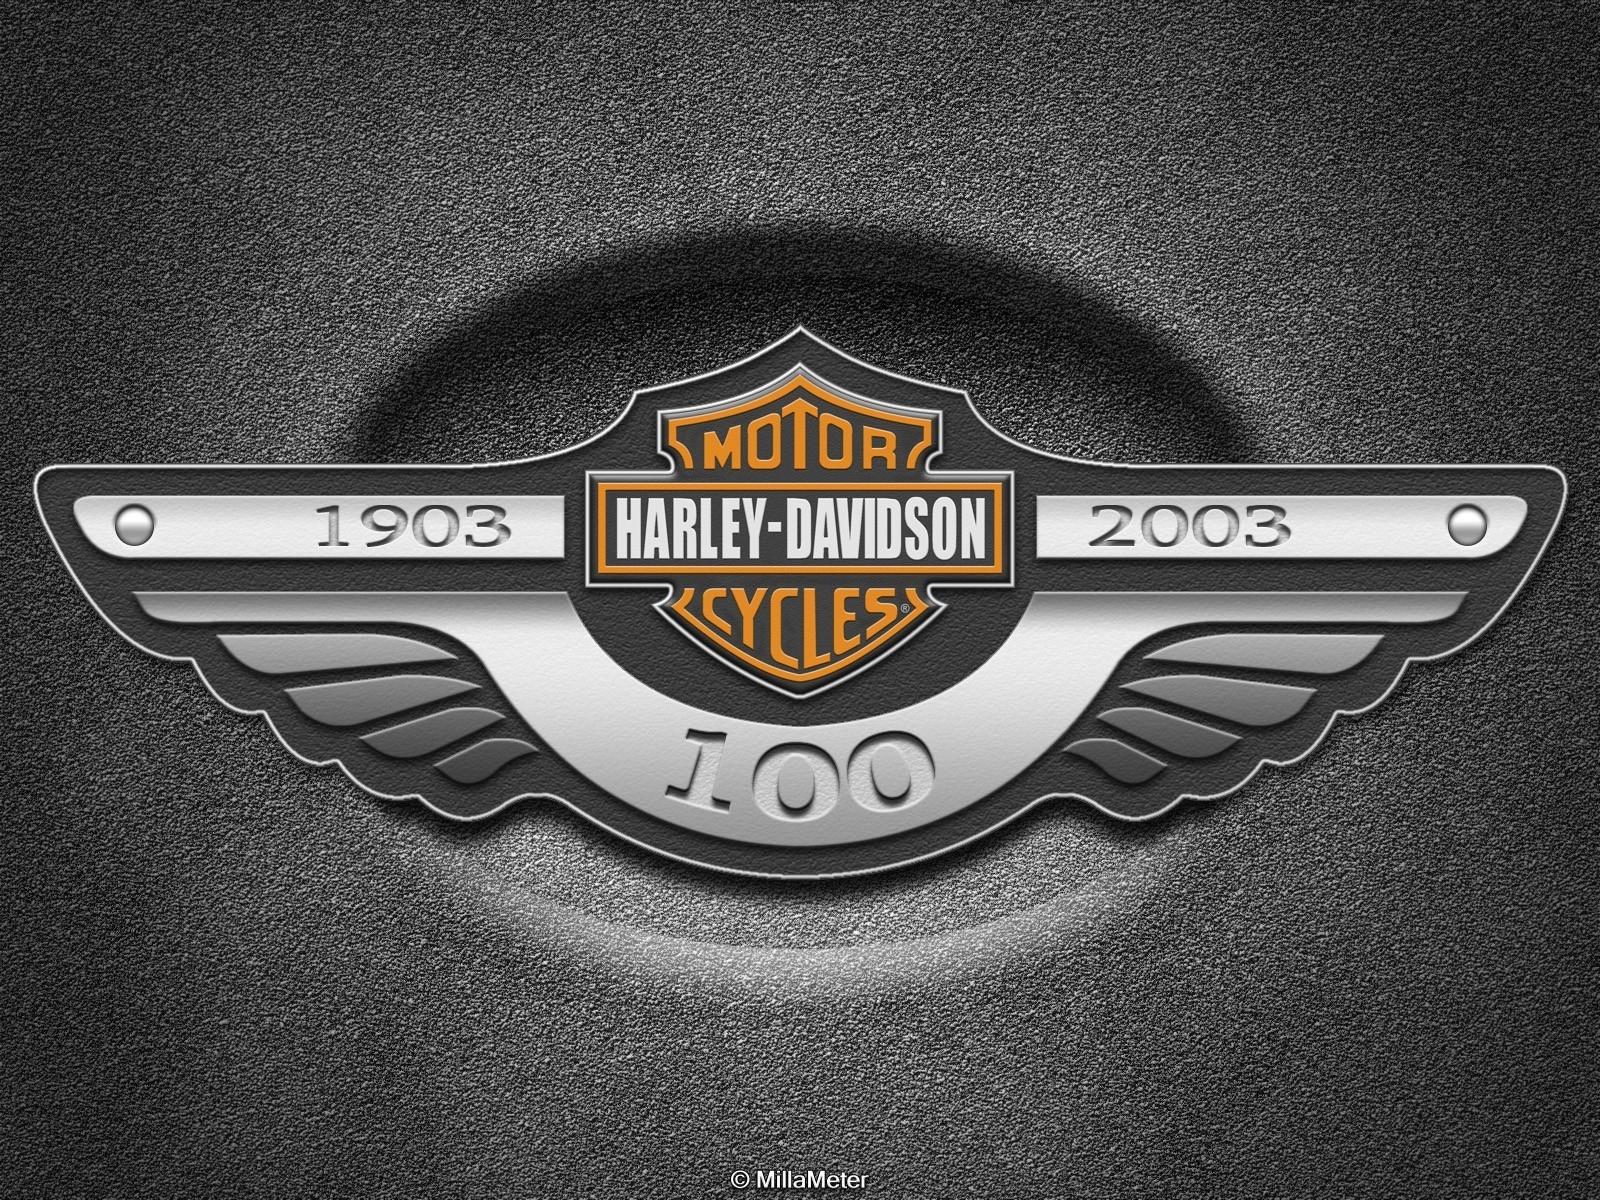 Wallpaper logo brand harley davidson steering wheel symbol logo brand harley davidson steering wheel wheel symbol emblem automotive exterior font firm motorcycles voltagebd Gallery